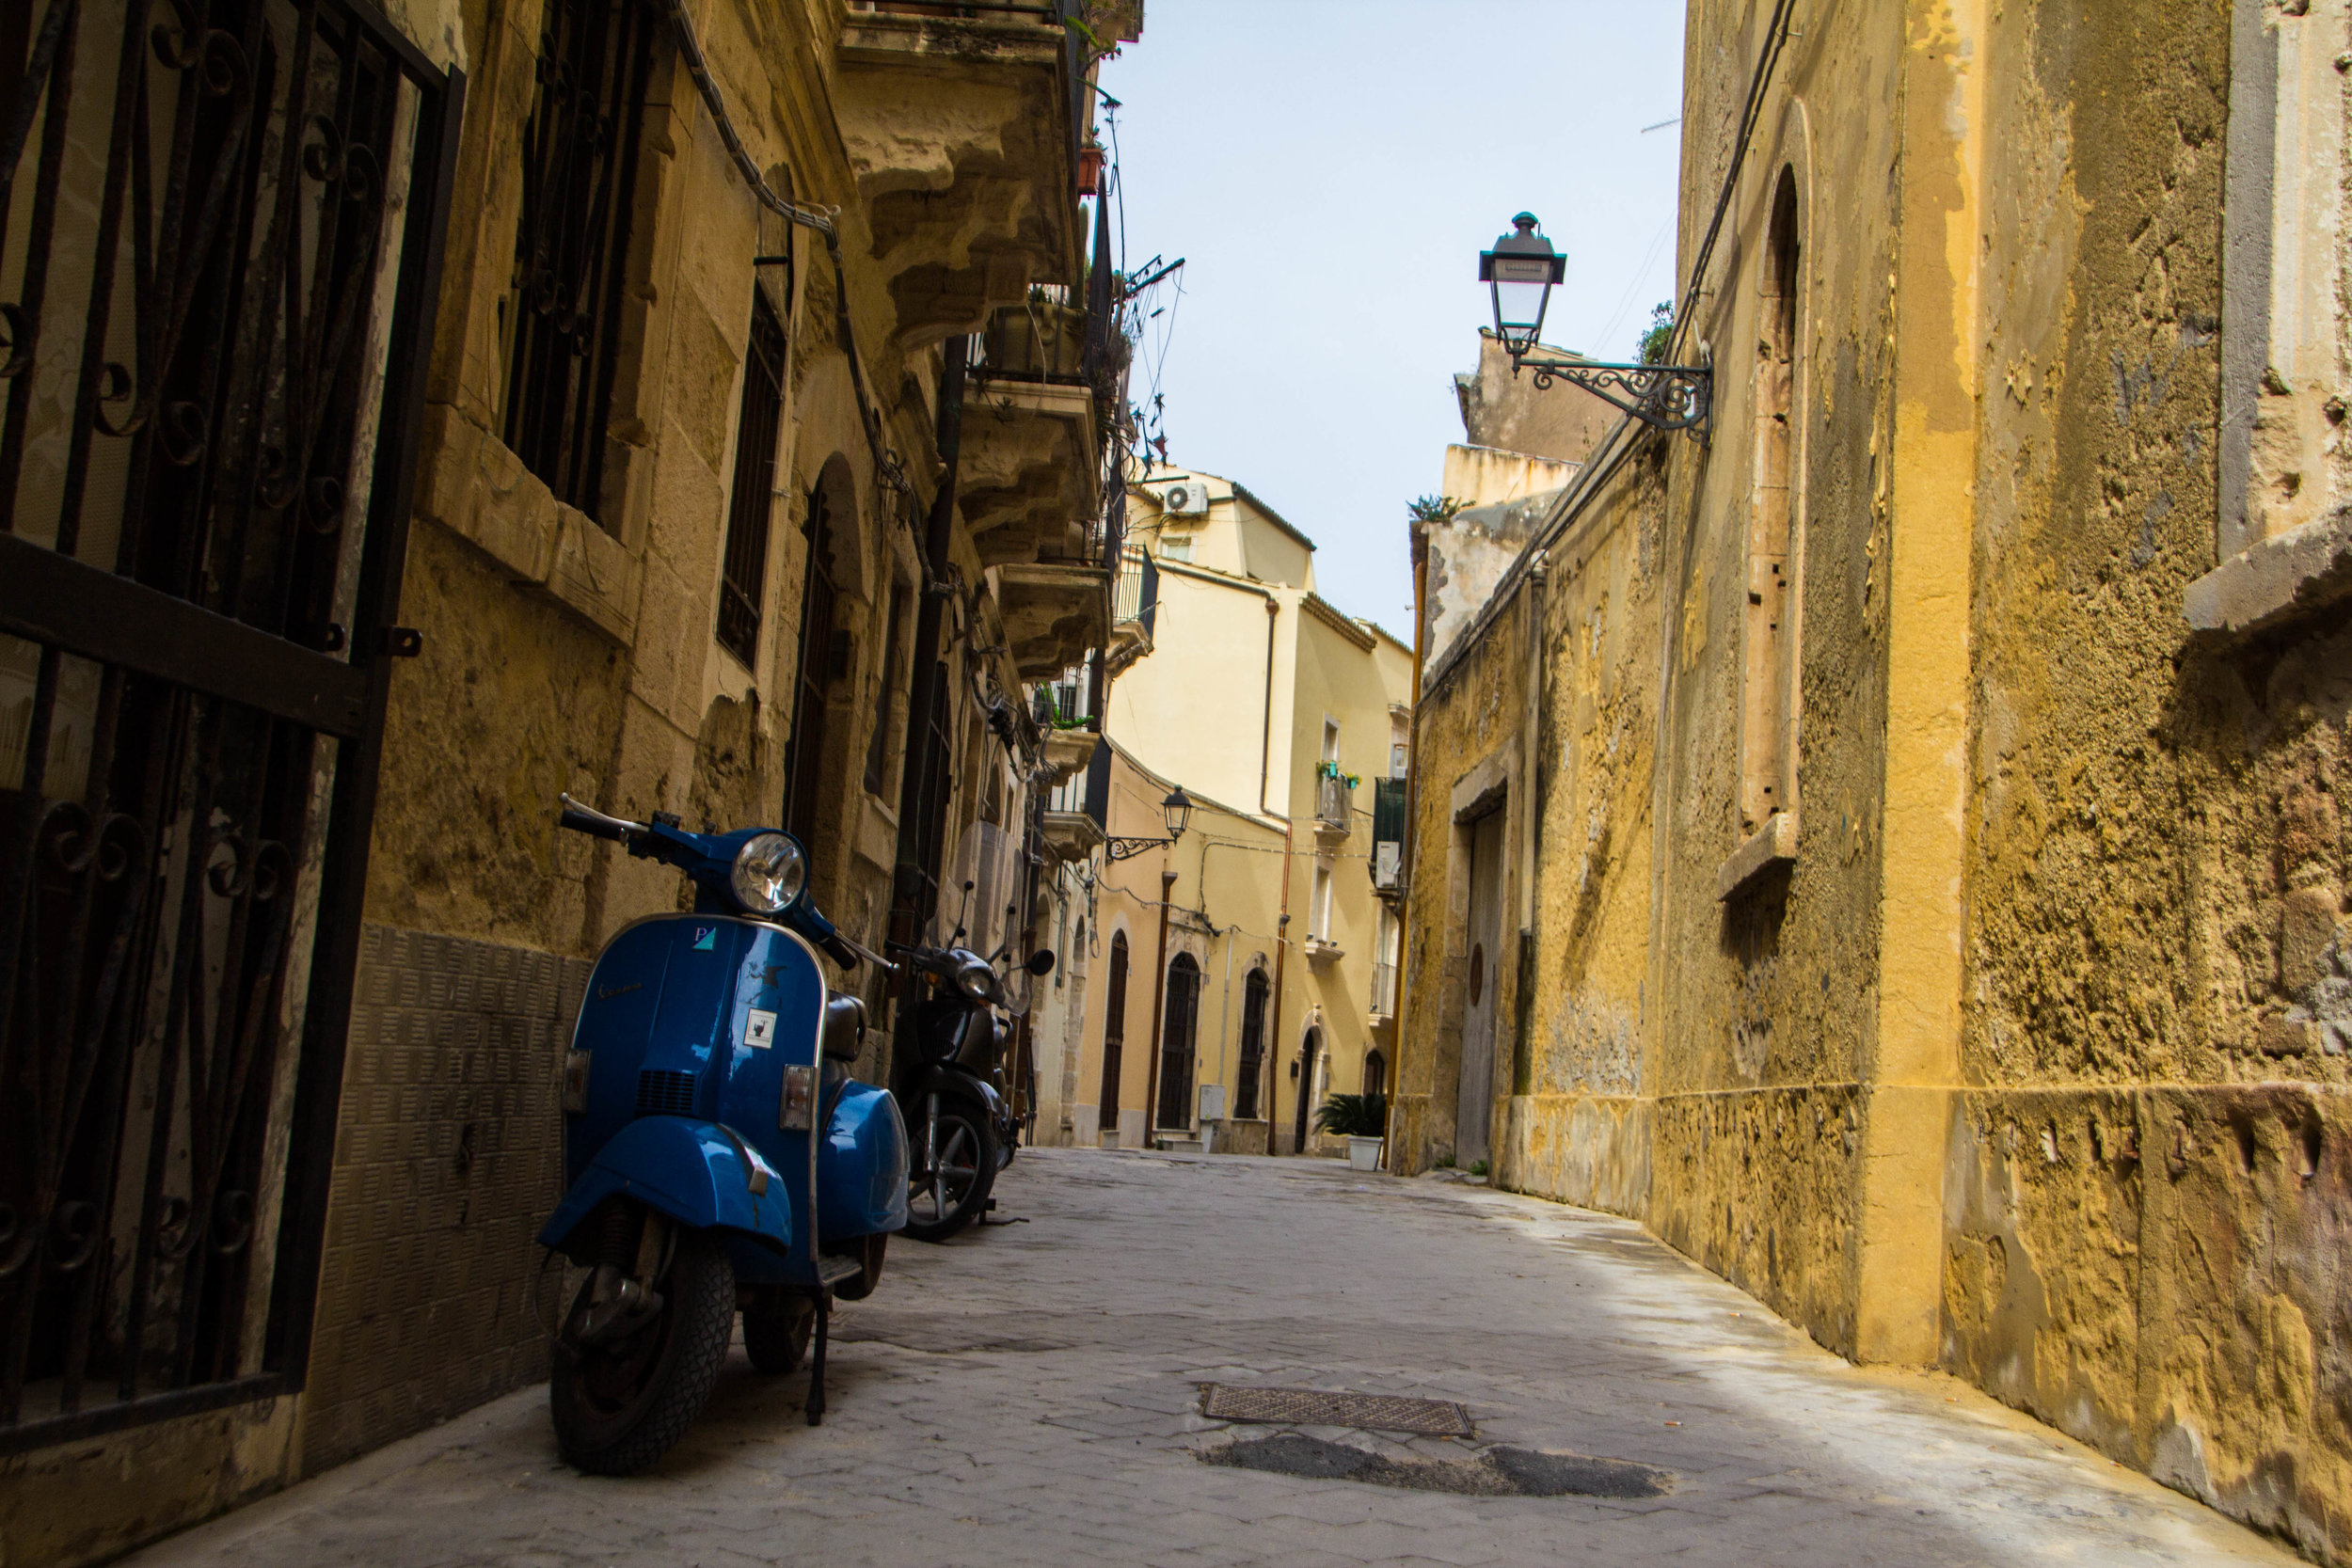 streets-ortygia-syracuse-sicily-17.jpg